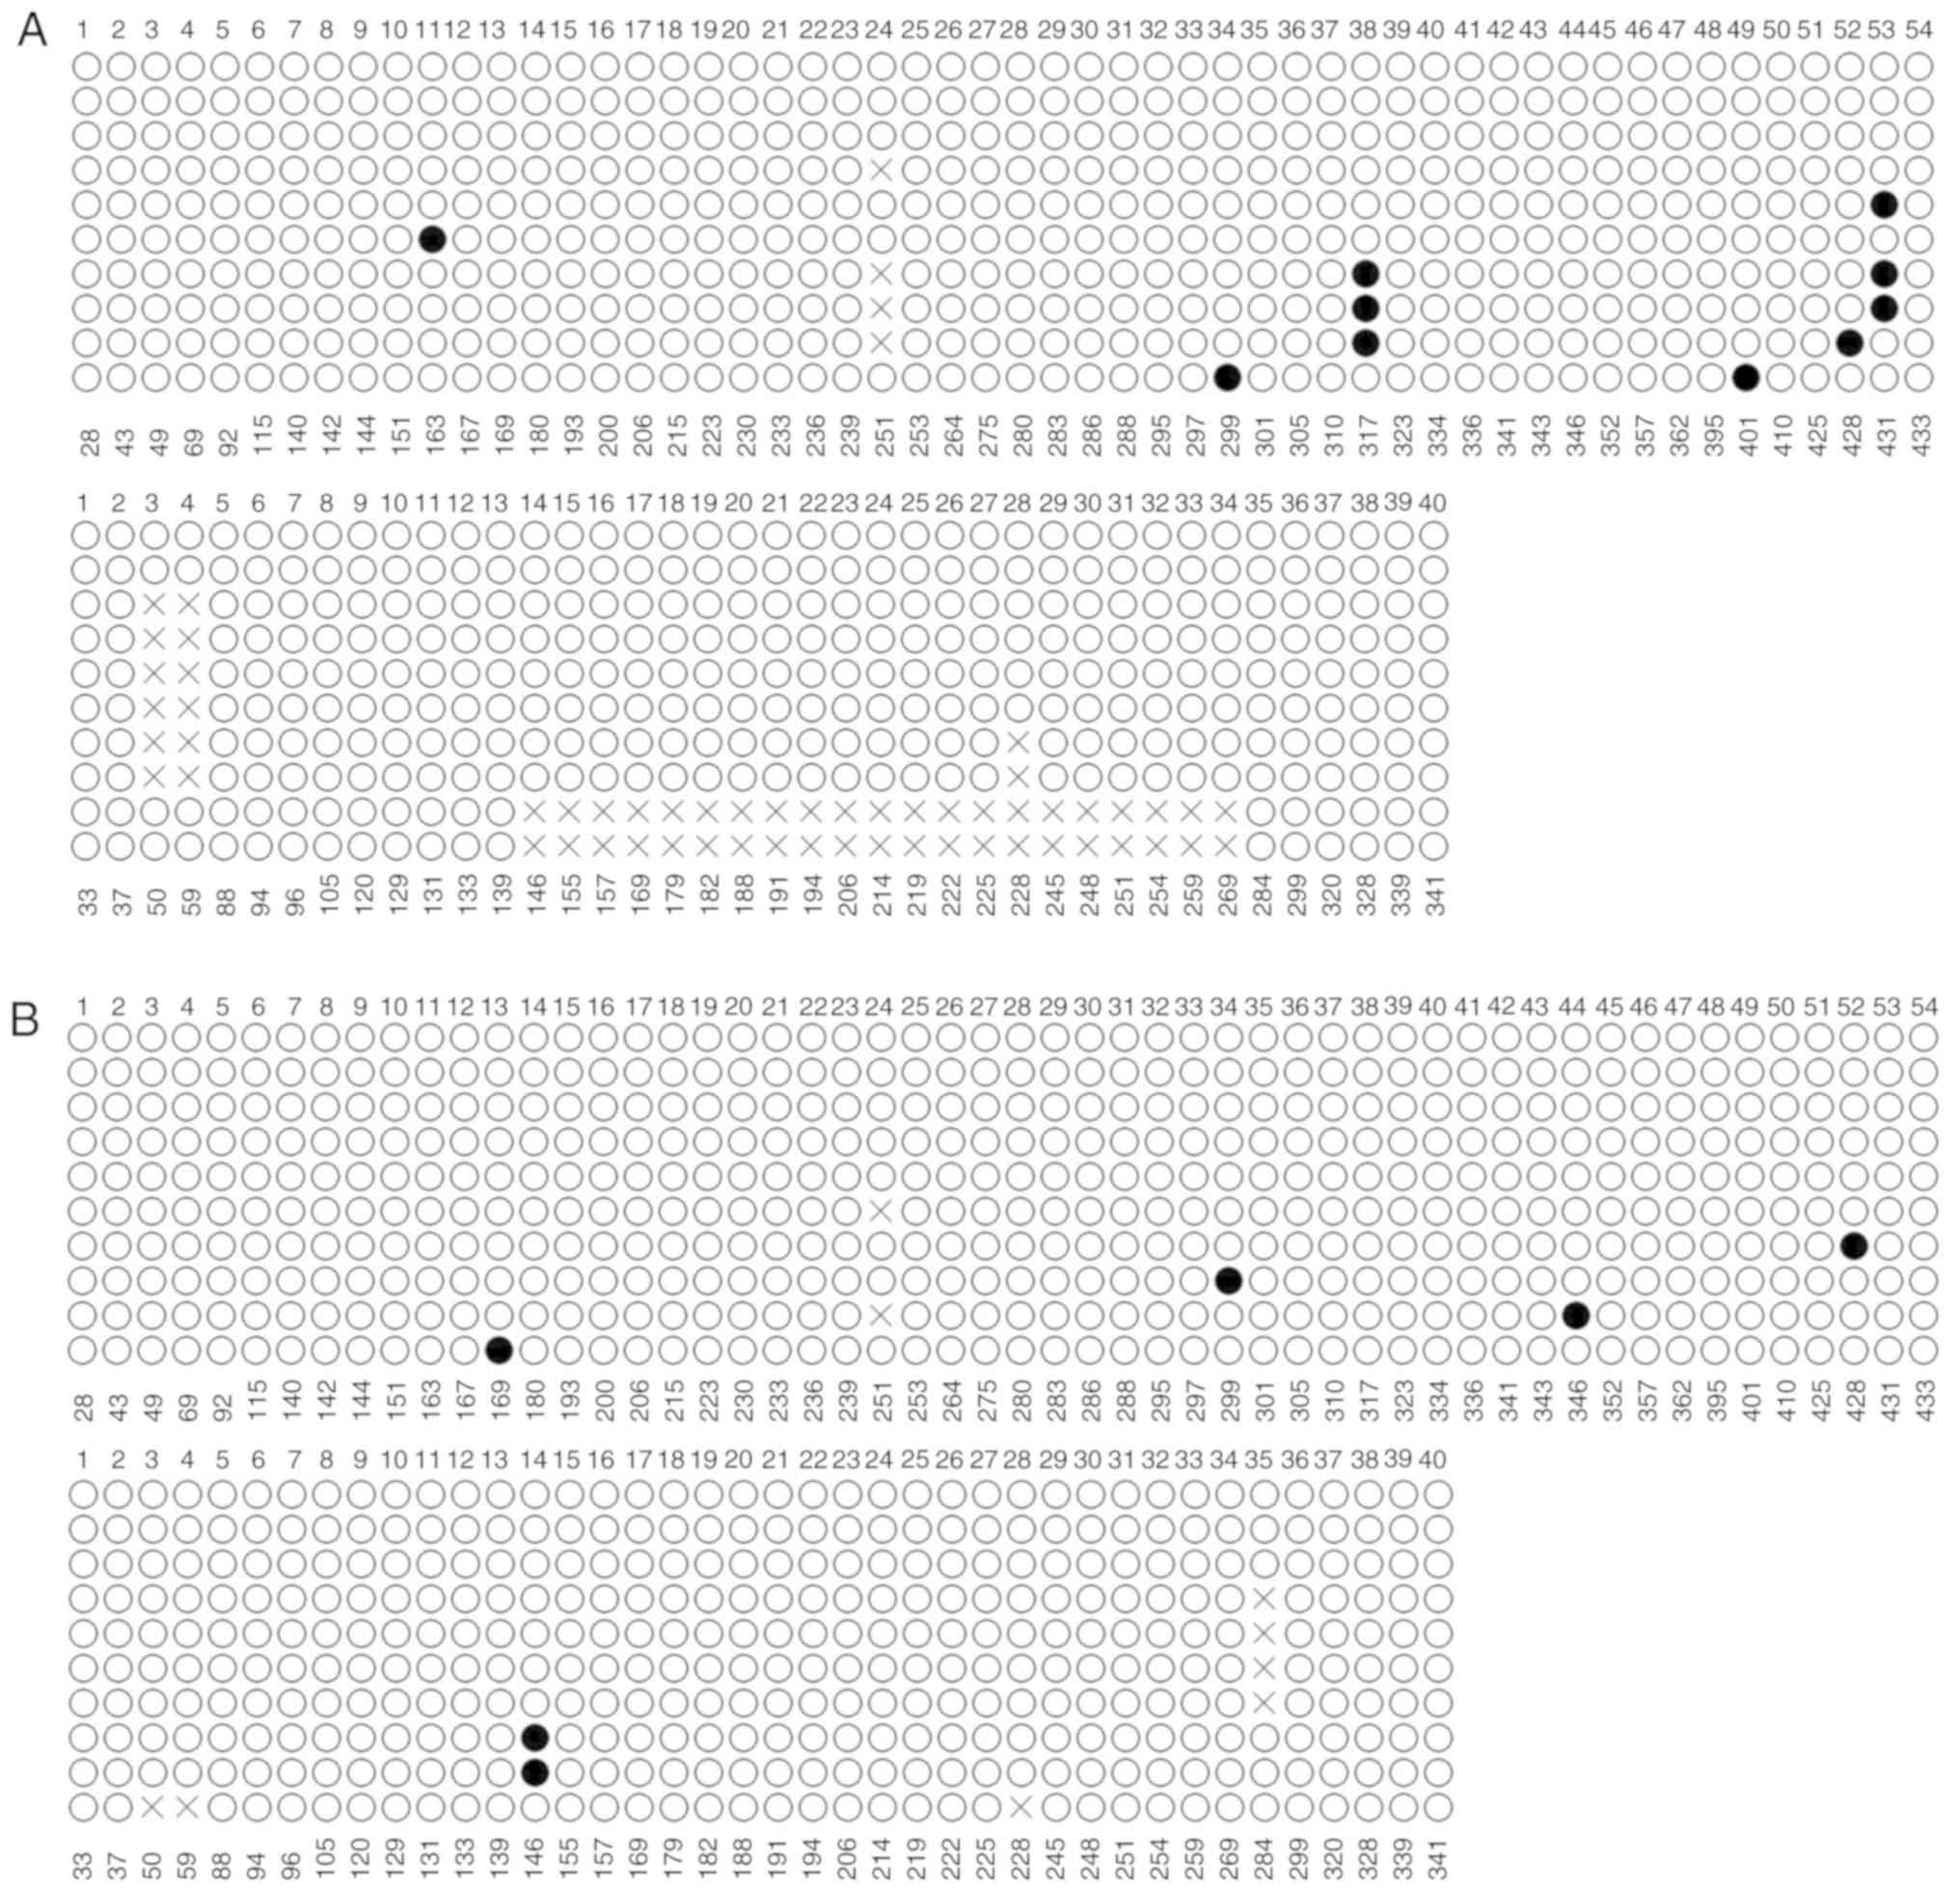 Analysis of promoter methylation and epigenetic regulation